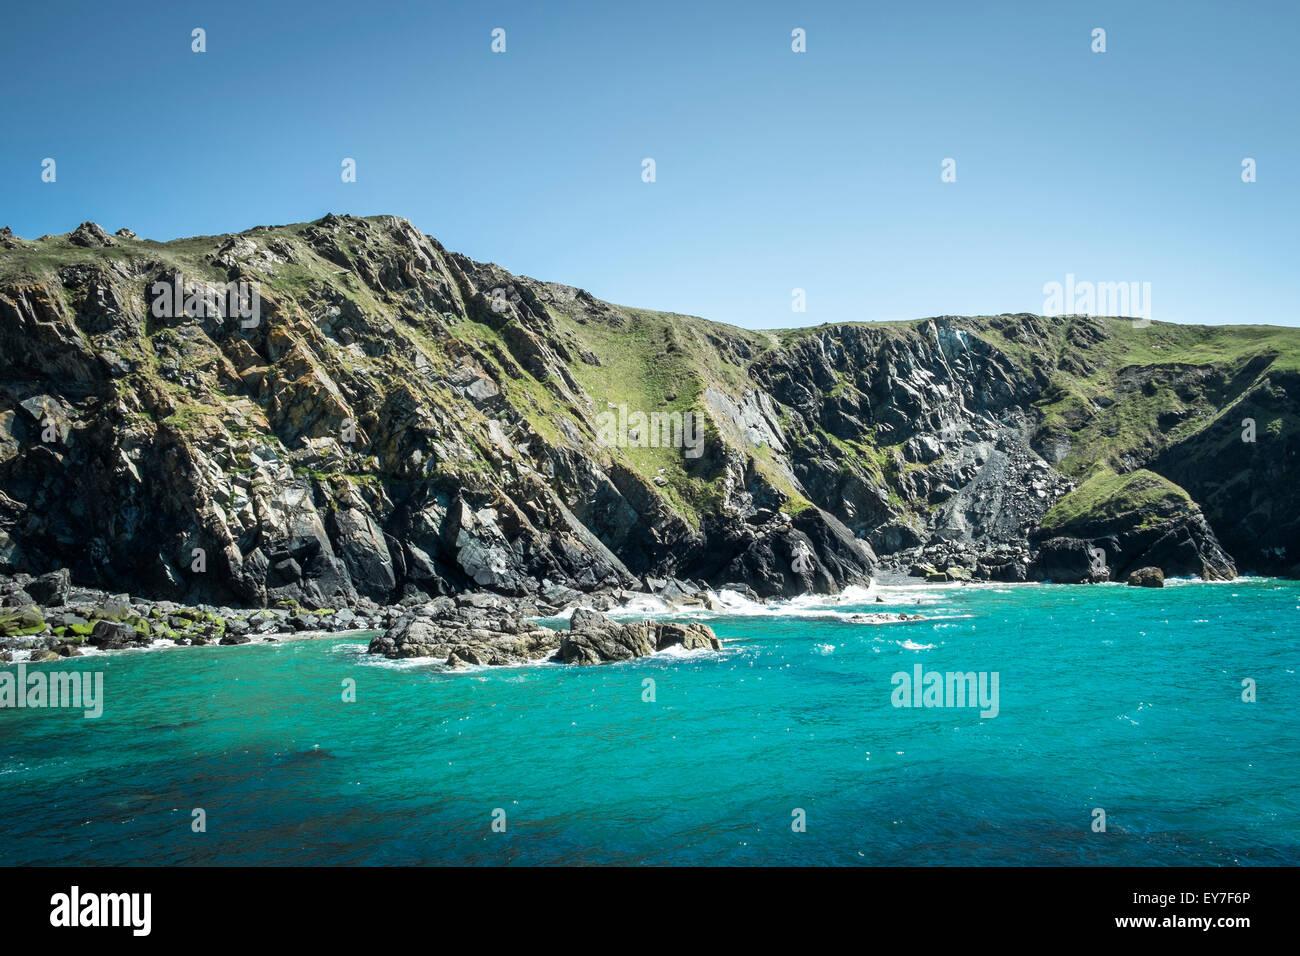 Landzunge und Klippen bei Mullion Cove, Halbinsel Lizard, Cornwall, England, UK Stockbild